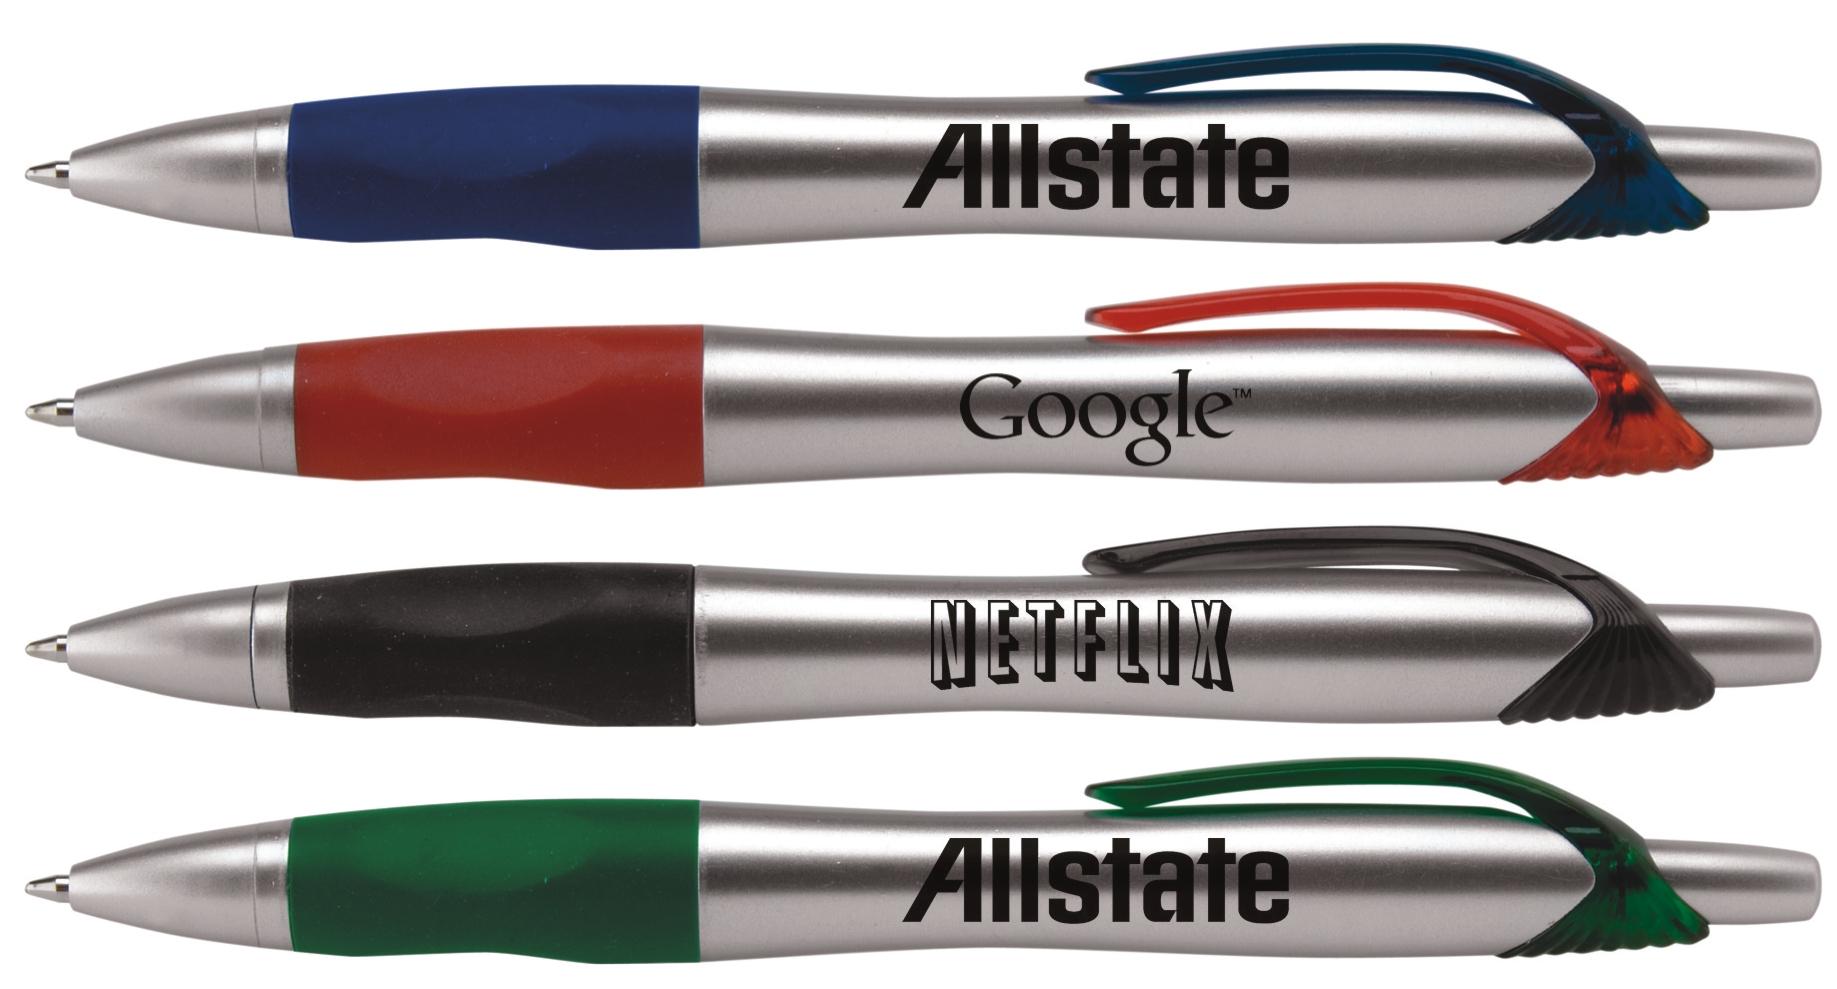 Arctic Fox Pen